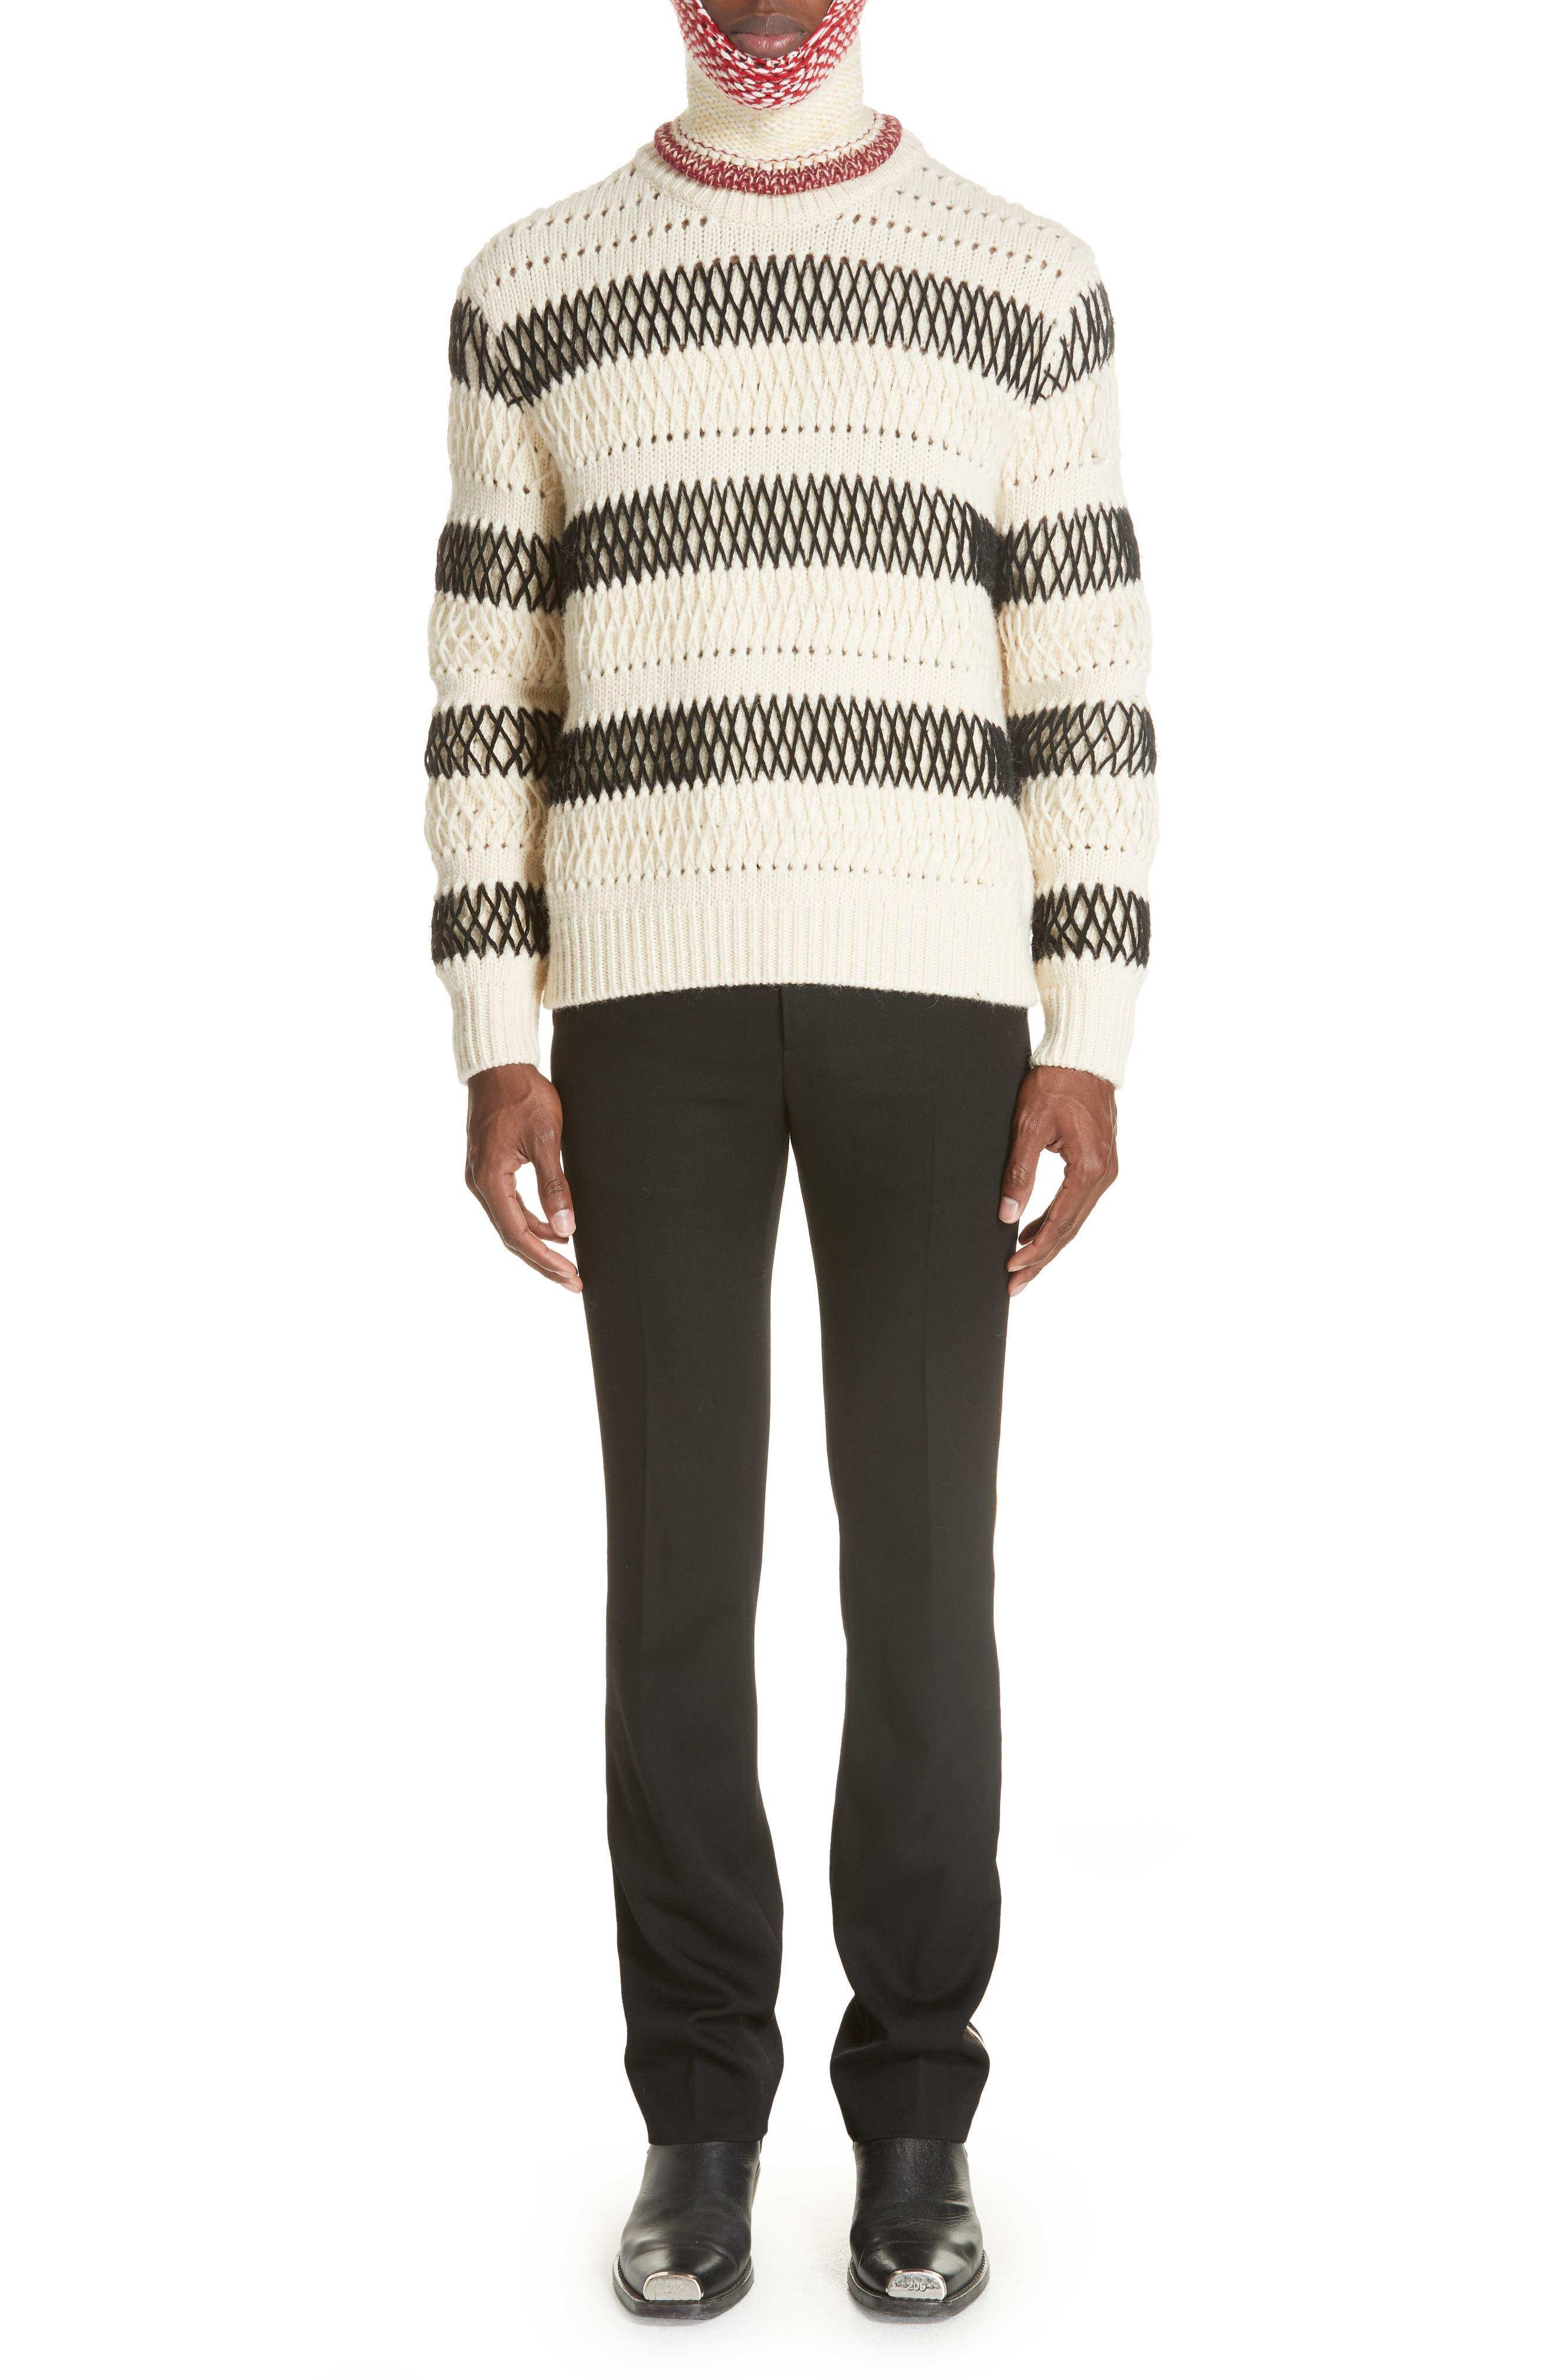 CALVIN KLEIN 205W39NYC,                             Uniform Stripe Trousers,                             Alternate thumbnail 7, color,                             060